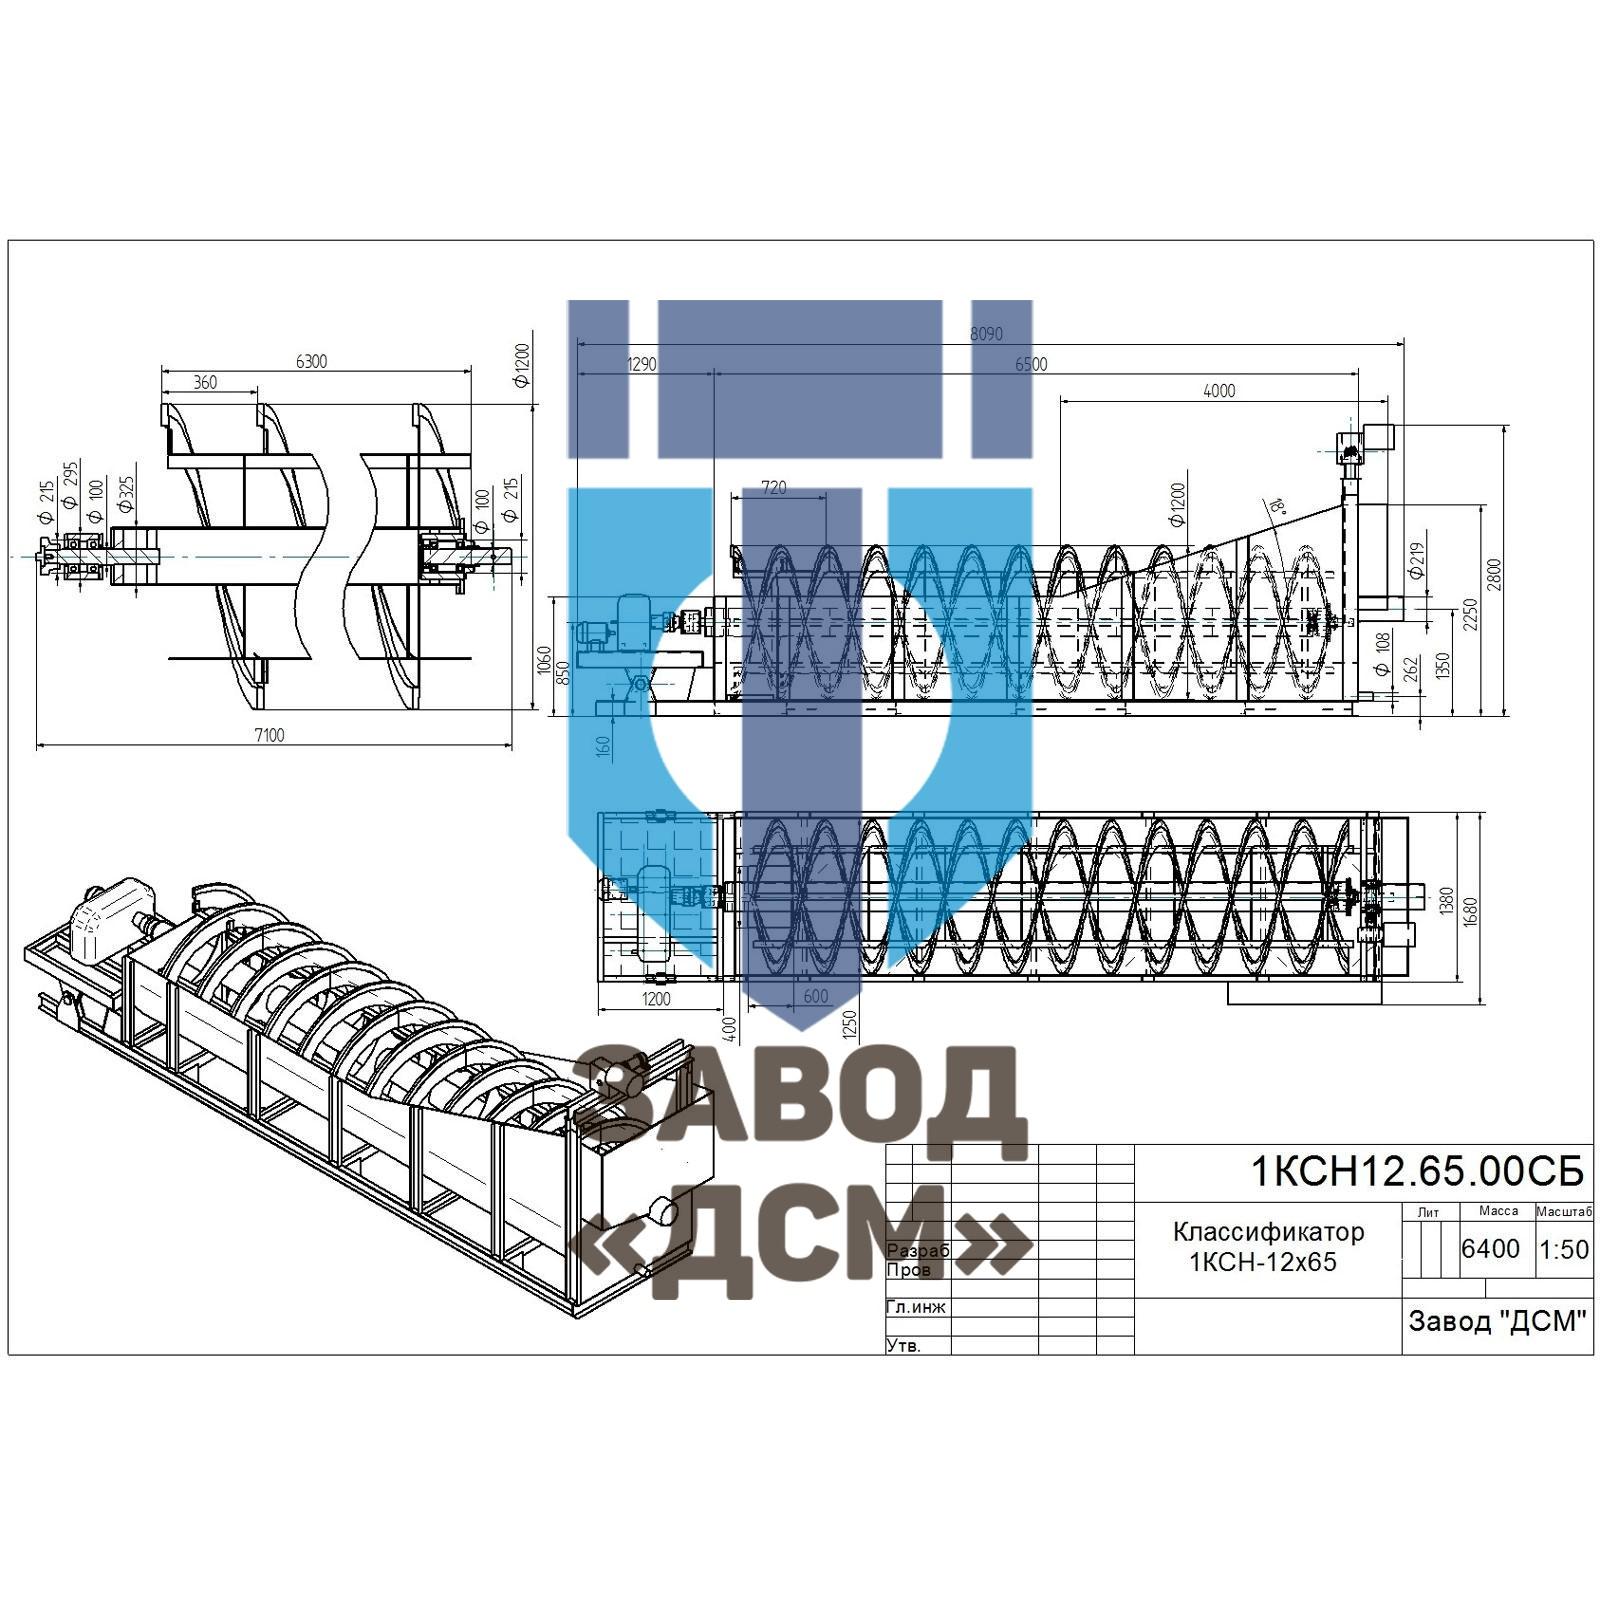 Чертеж классификатор спиральный 1КСН-12х65